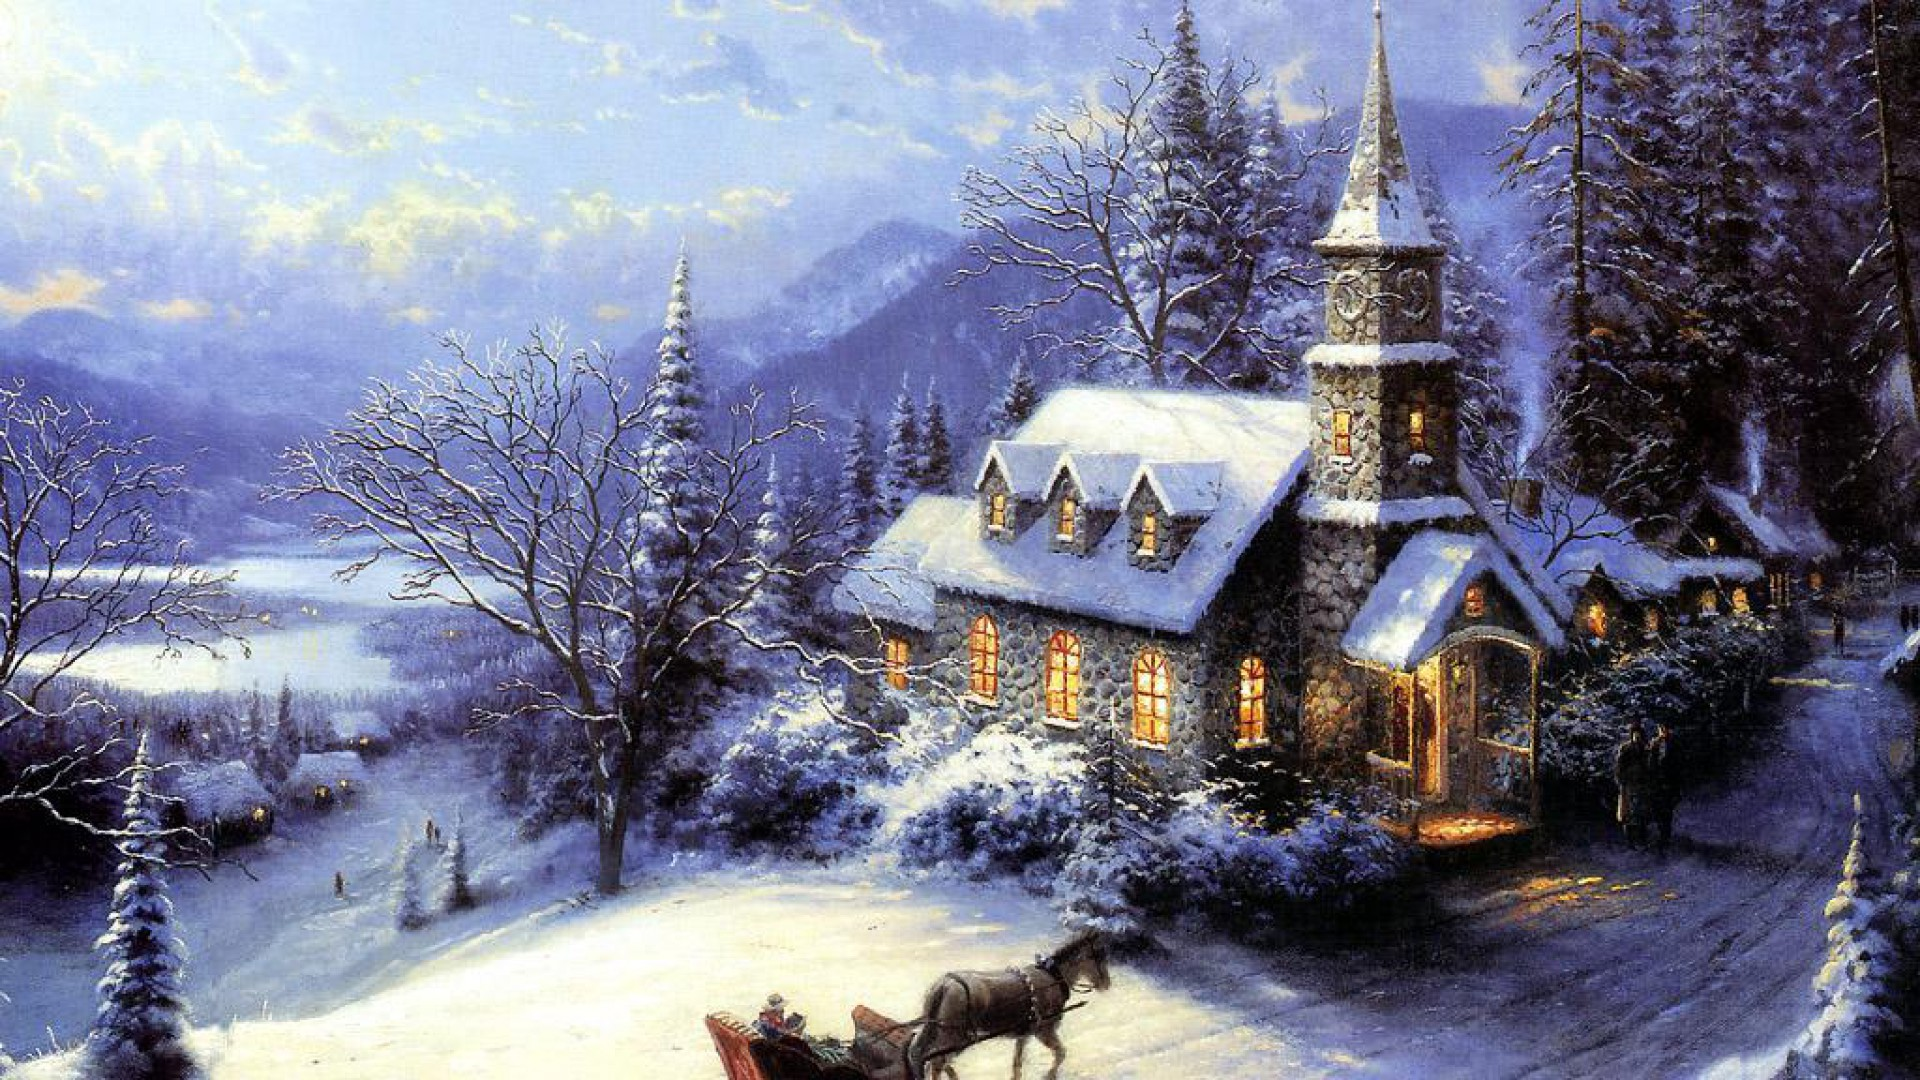 Christmas in an alpine village